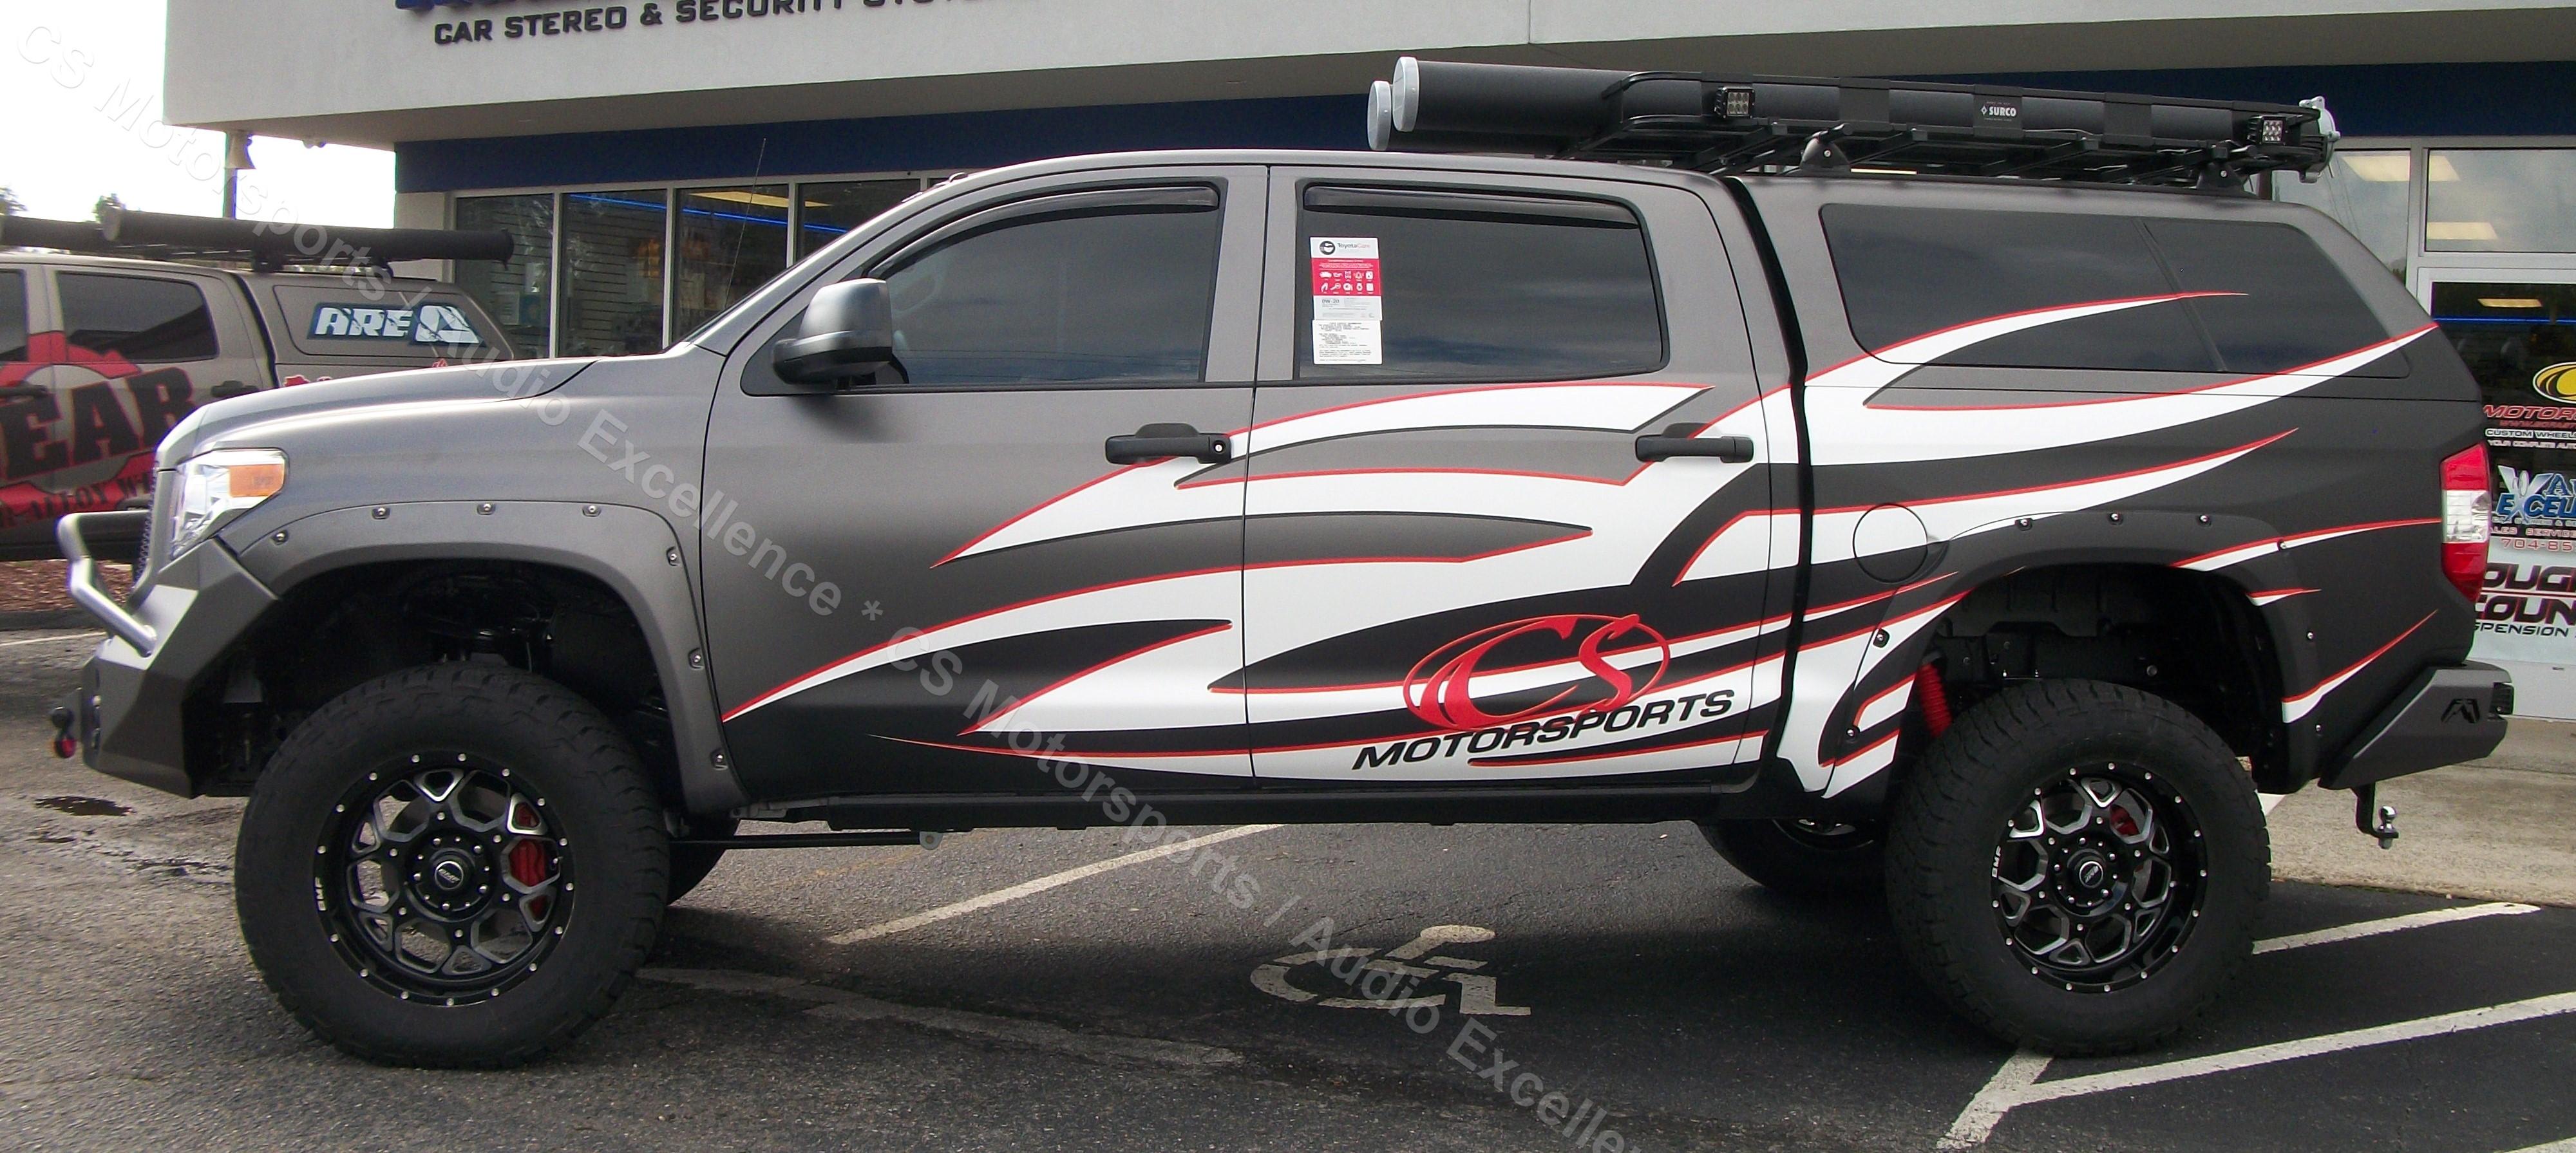 2014 Toyota Tundra Crew Max (810)